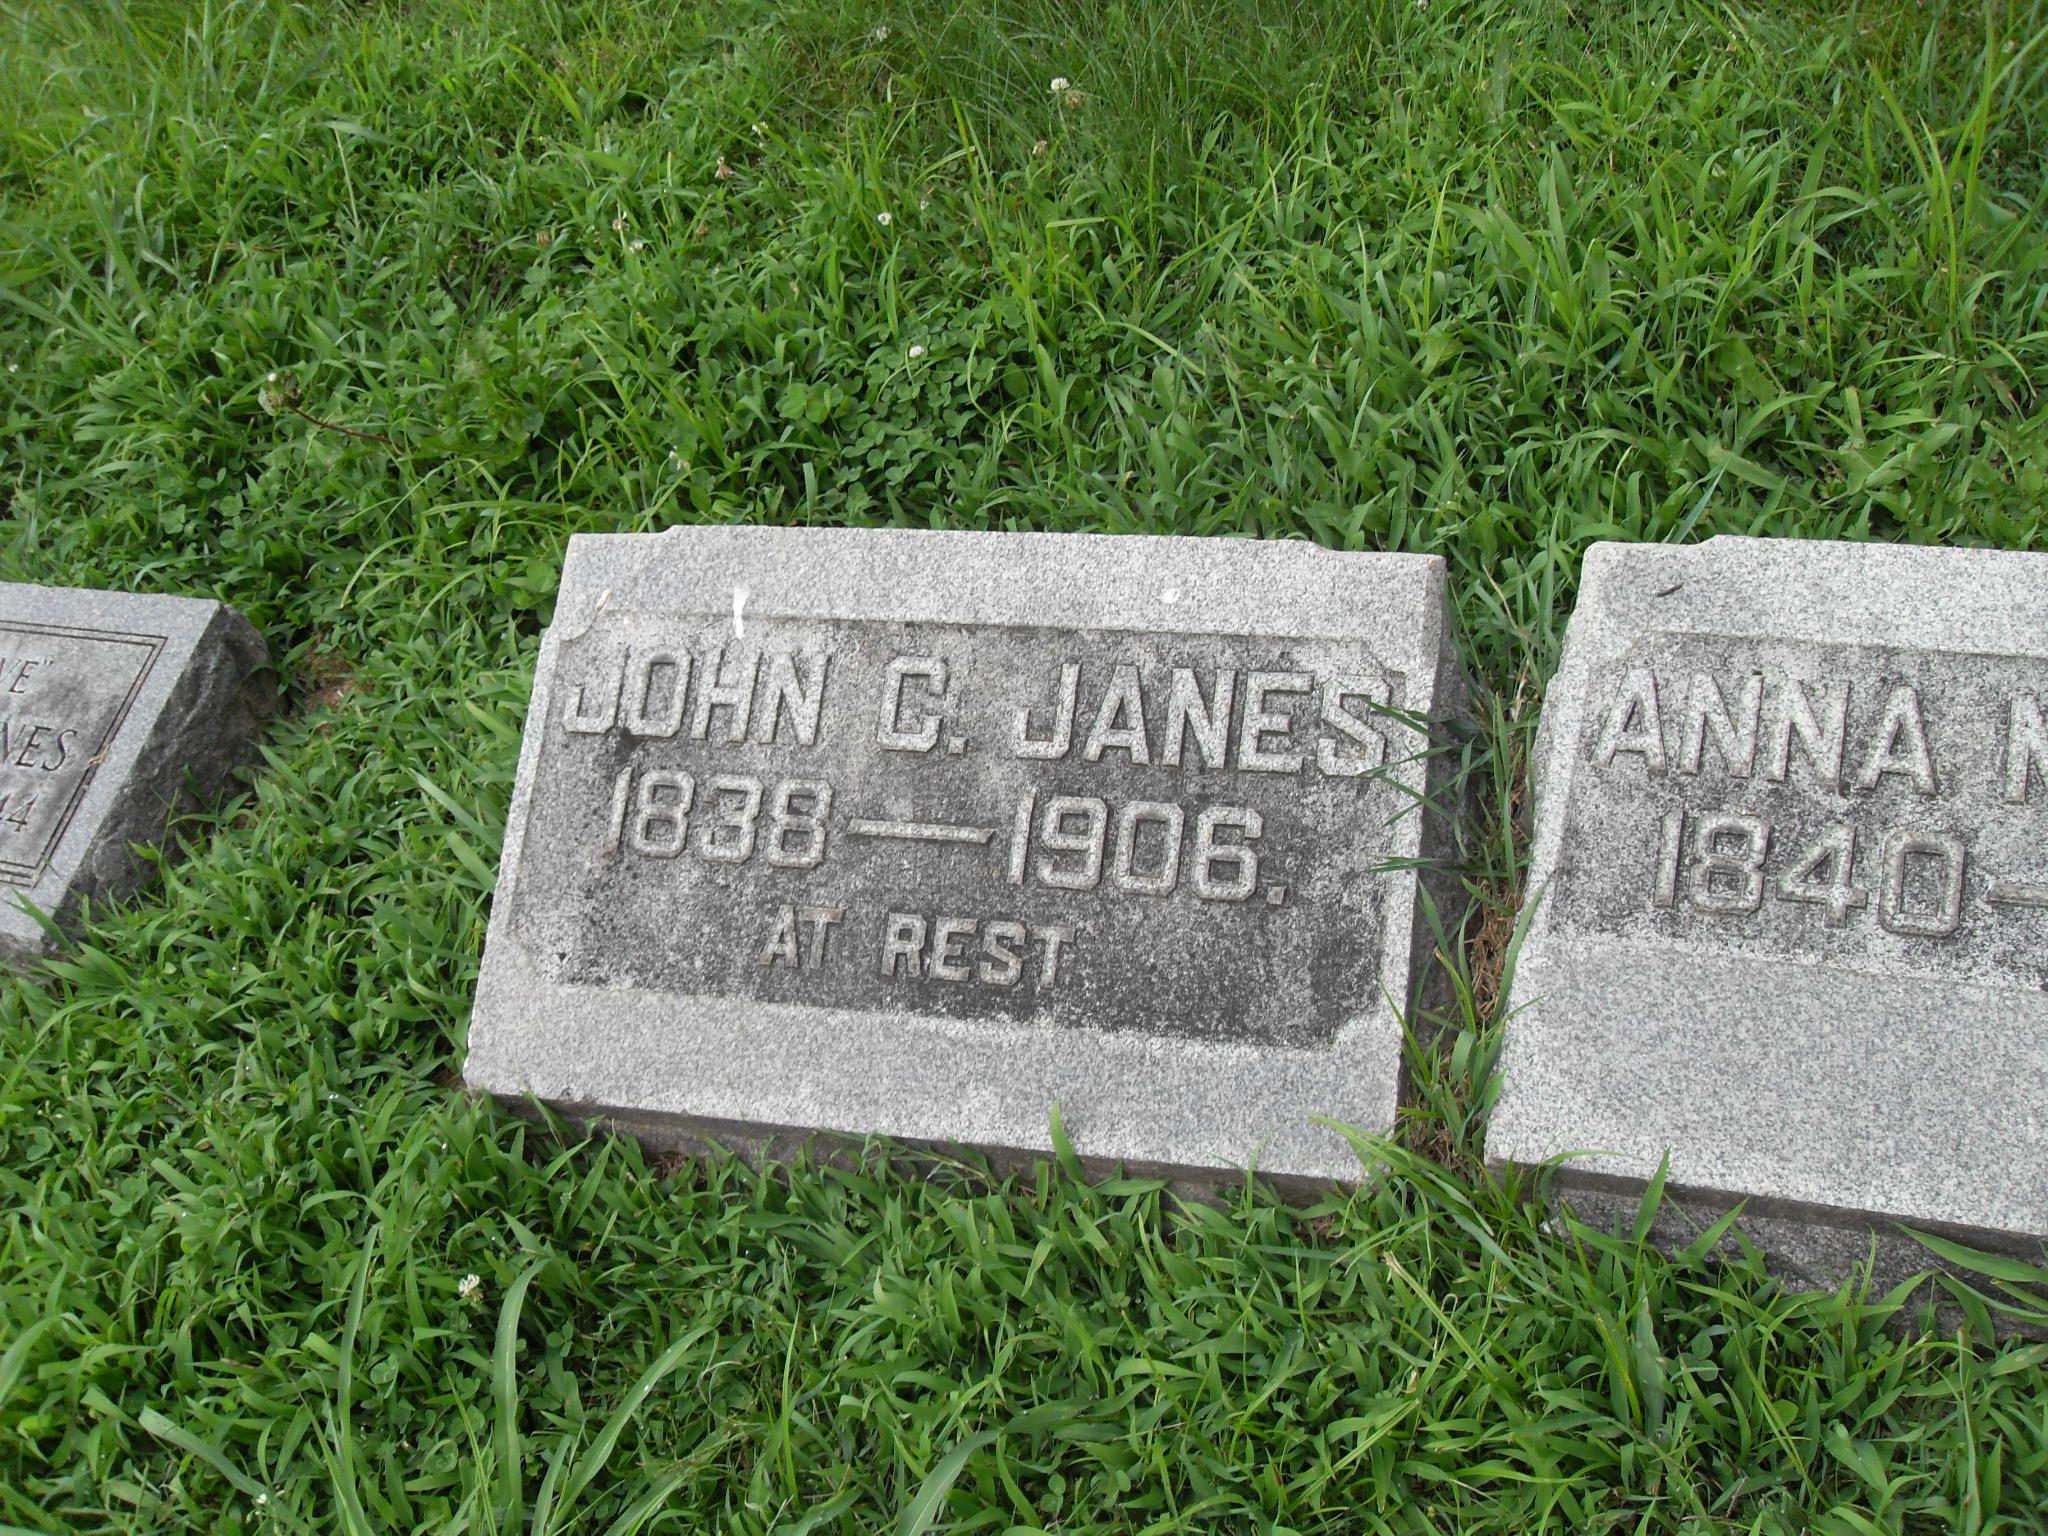 ea37f0e4d37f14fb32dc7d57a1ccef50 - Louisville Memorial Gardens Find A Grave